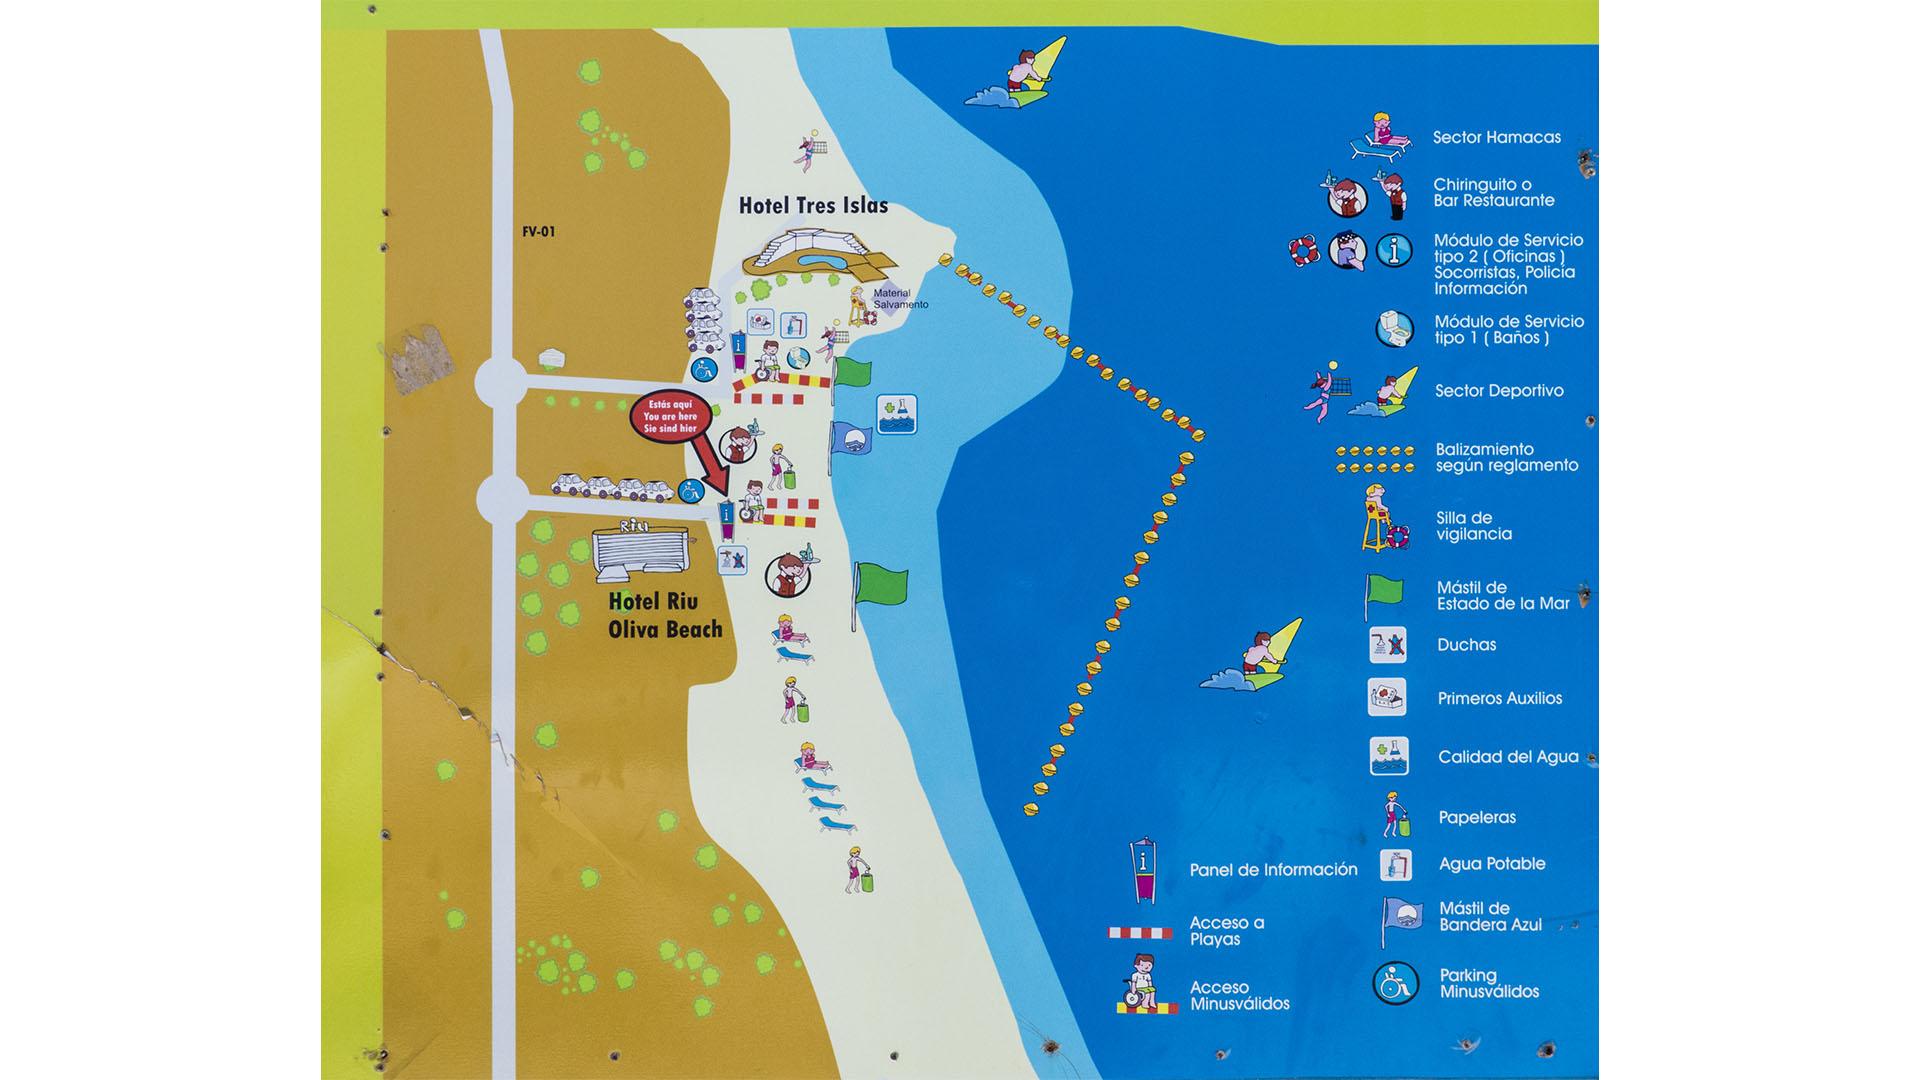 Die Strände Fuerteventuras: Playa bajo negro – Playa larga